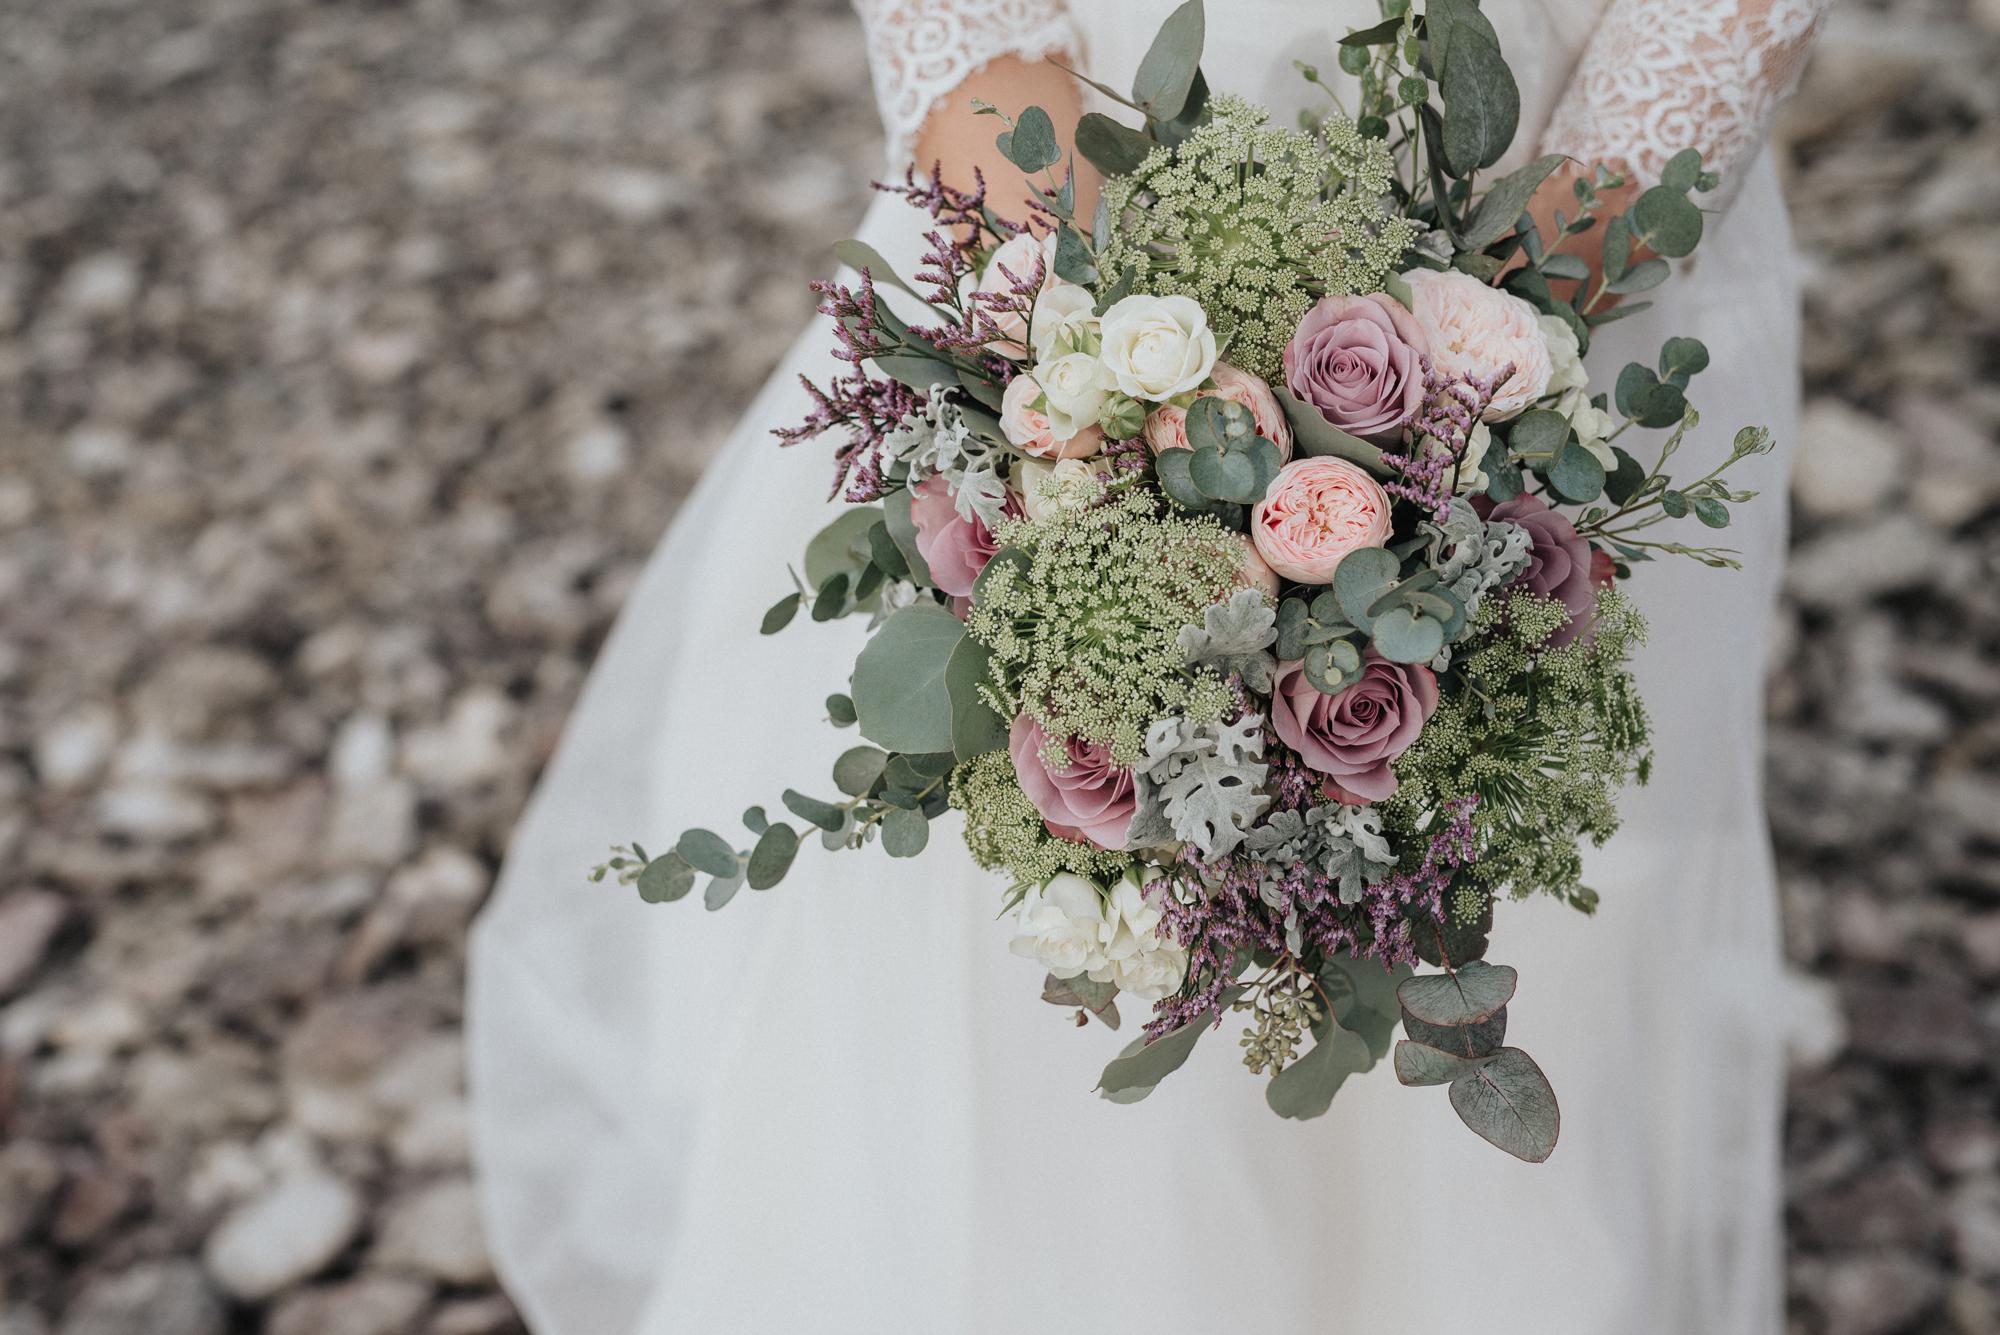 039-irisdals-blomsterhandel-brudbukett-neas-fotografi.jpg